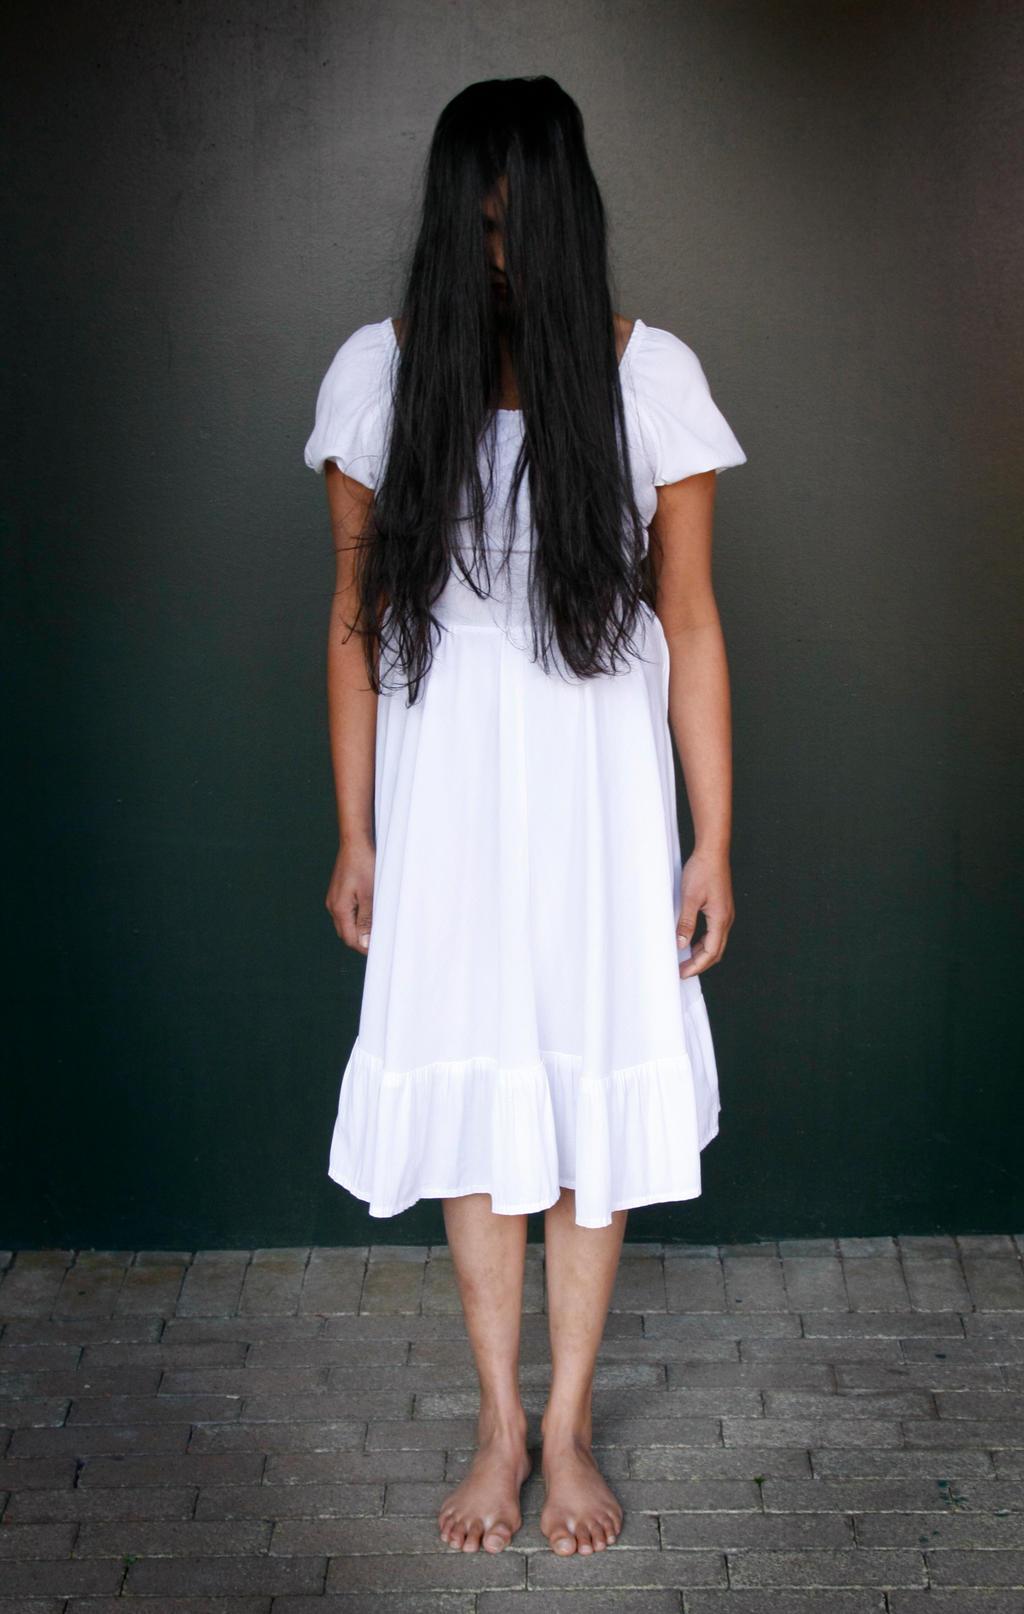 Ghoul 1 by CathleenTarawhiti